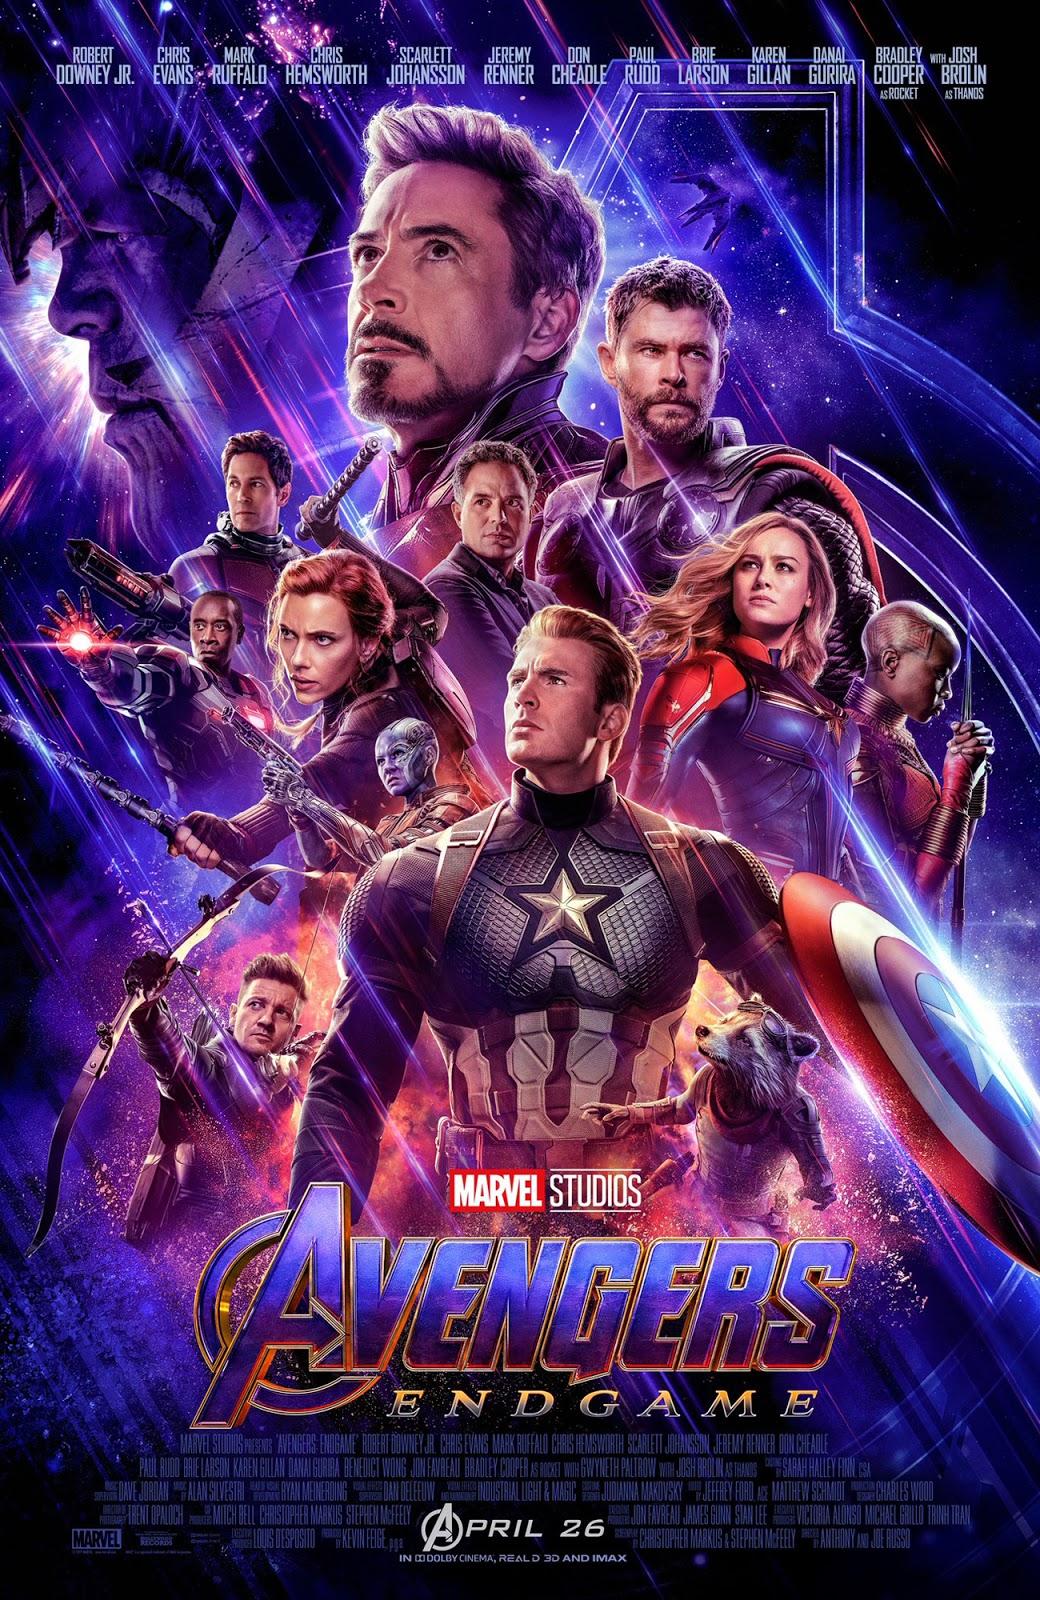 Avengers Endgame 2019 Hd Wallpapers